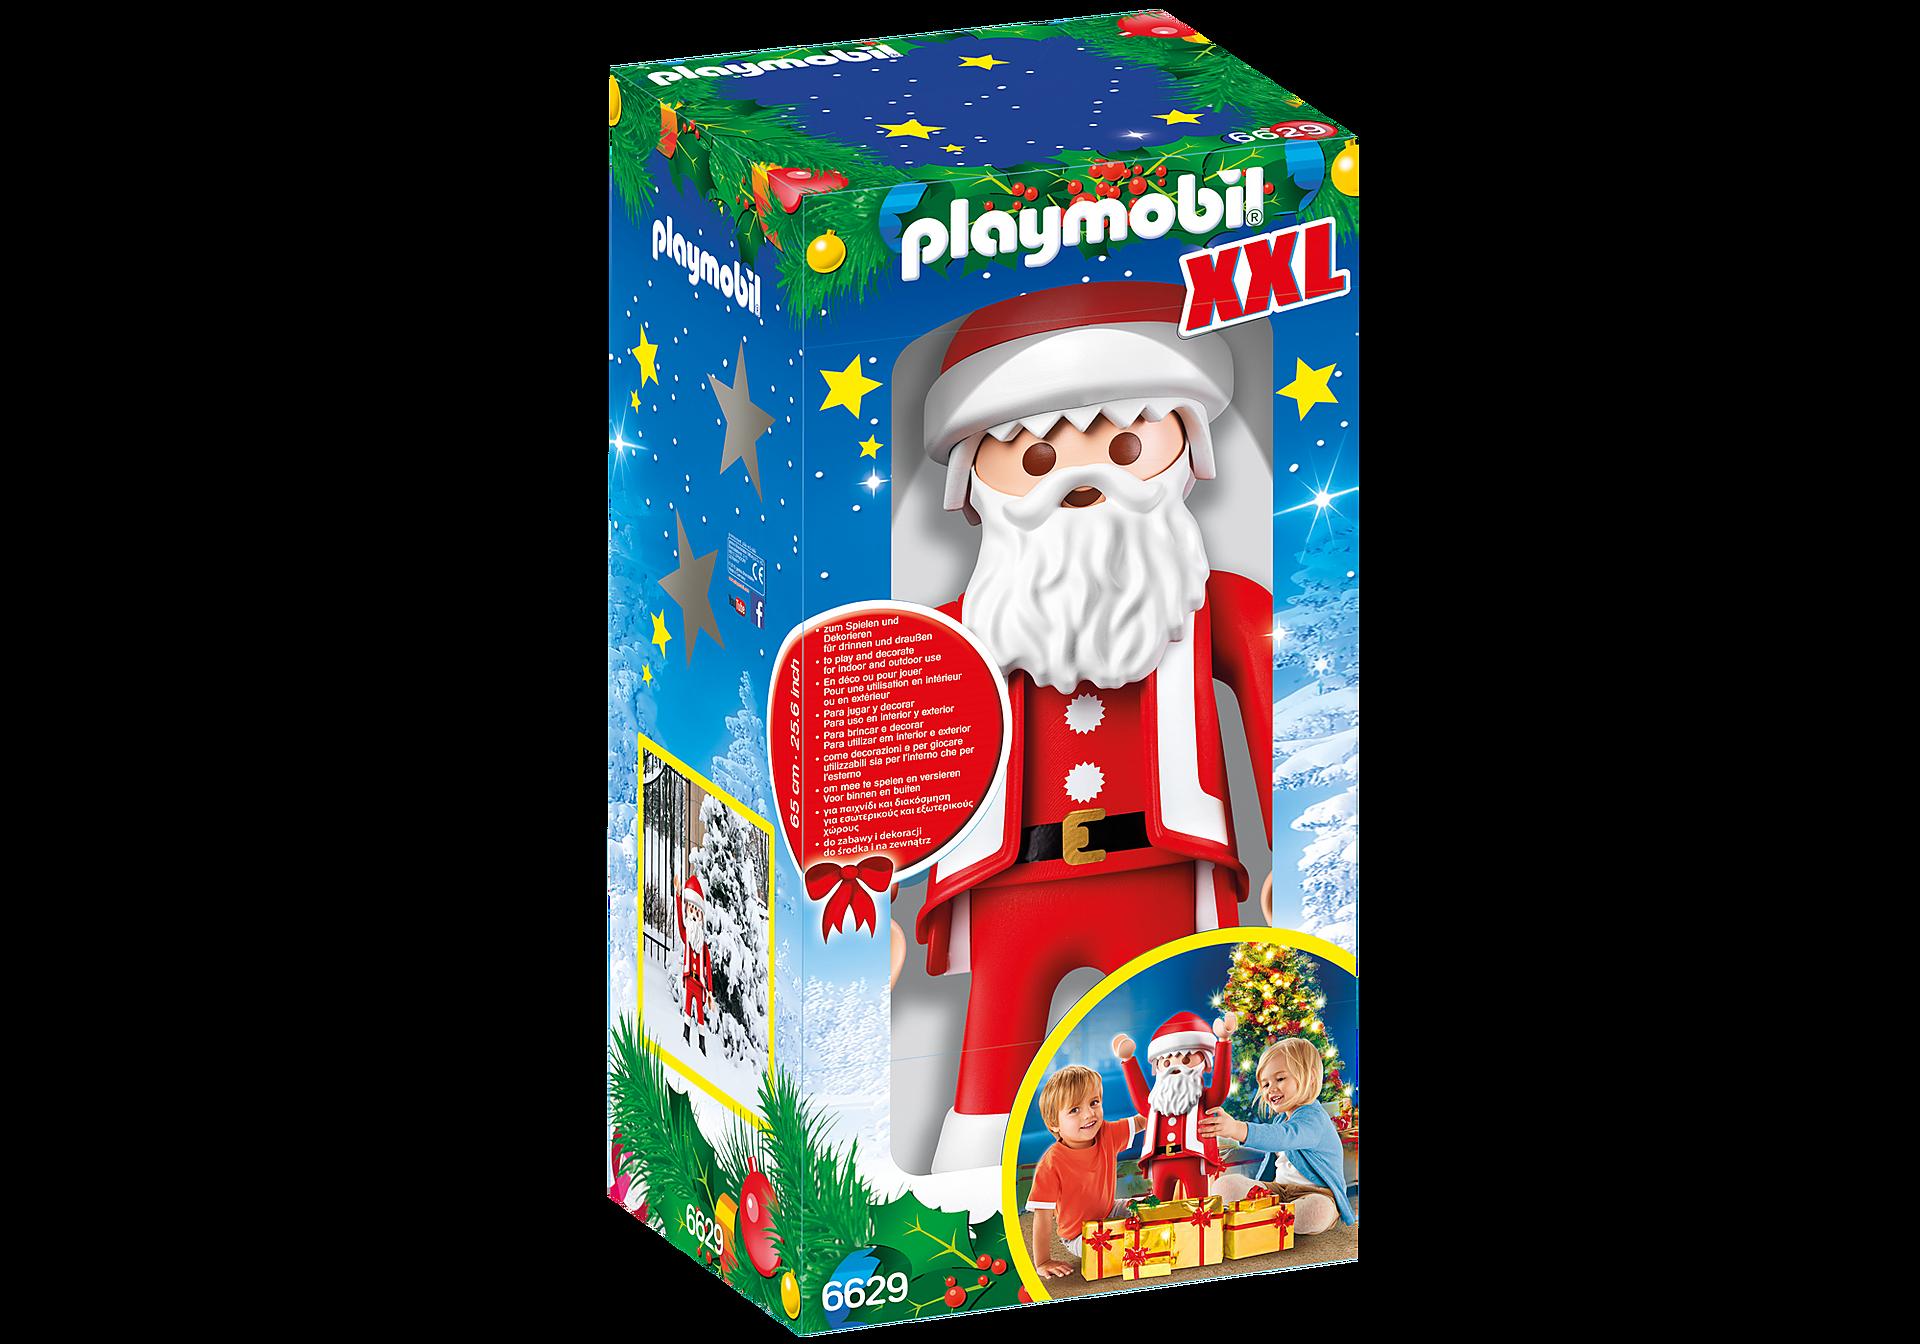 6629 PLAYMOBIL XXL-Weihnachtsmann zoom image2